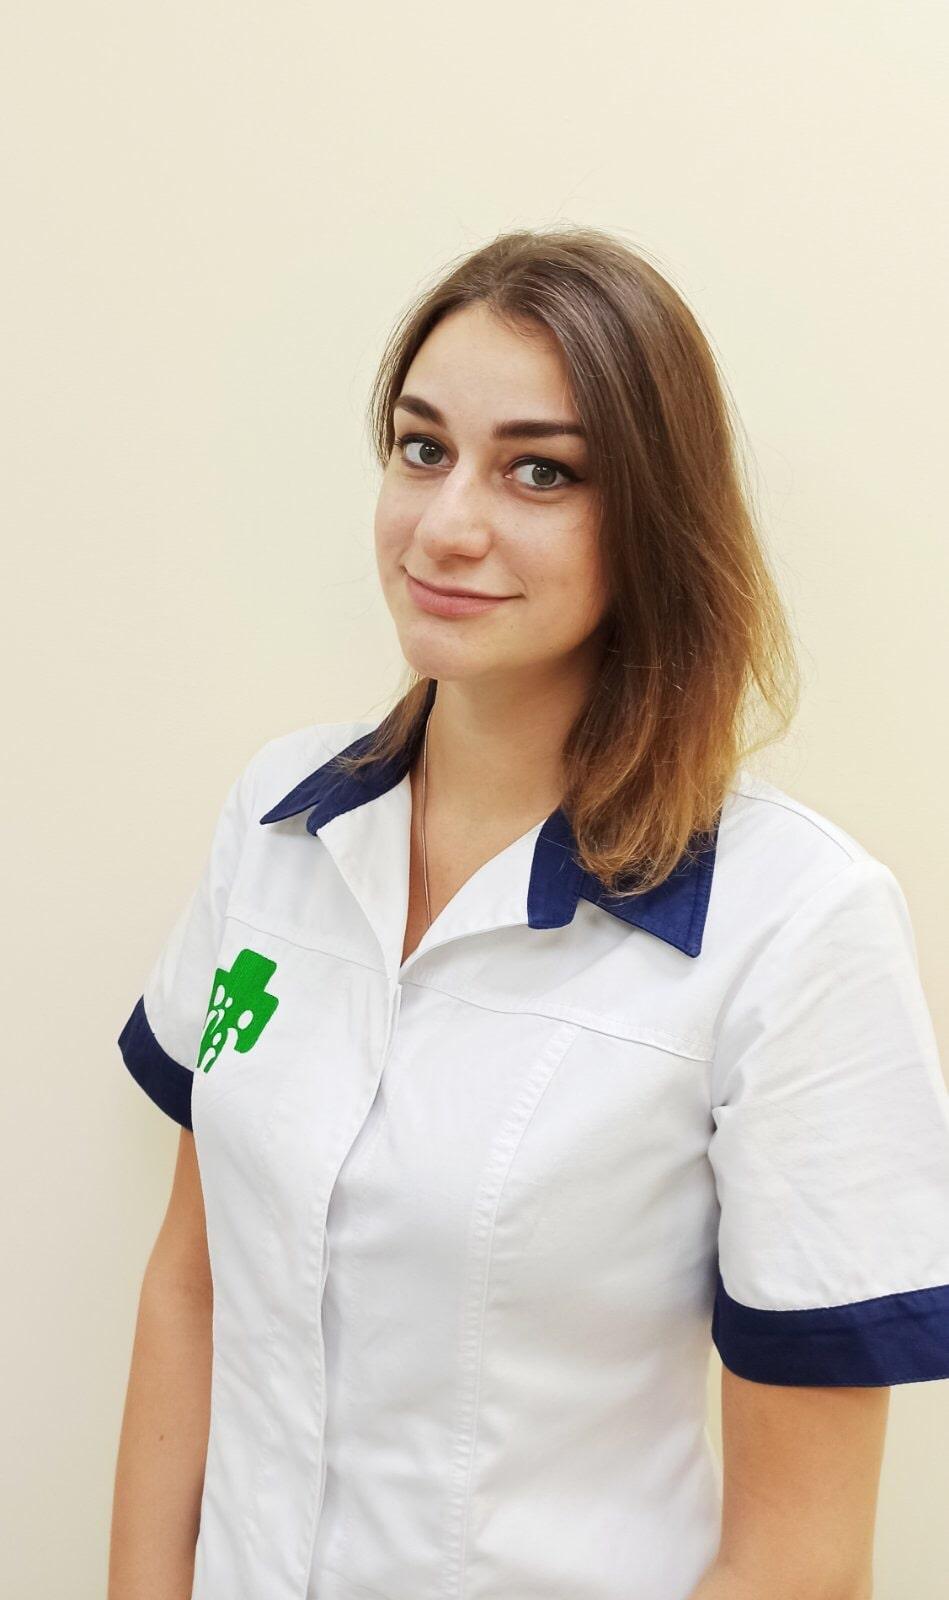 Аксëнова Екатерина Анатольевна